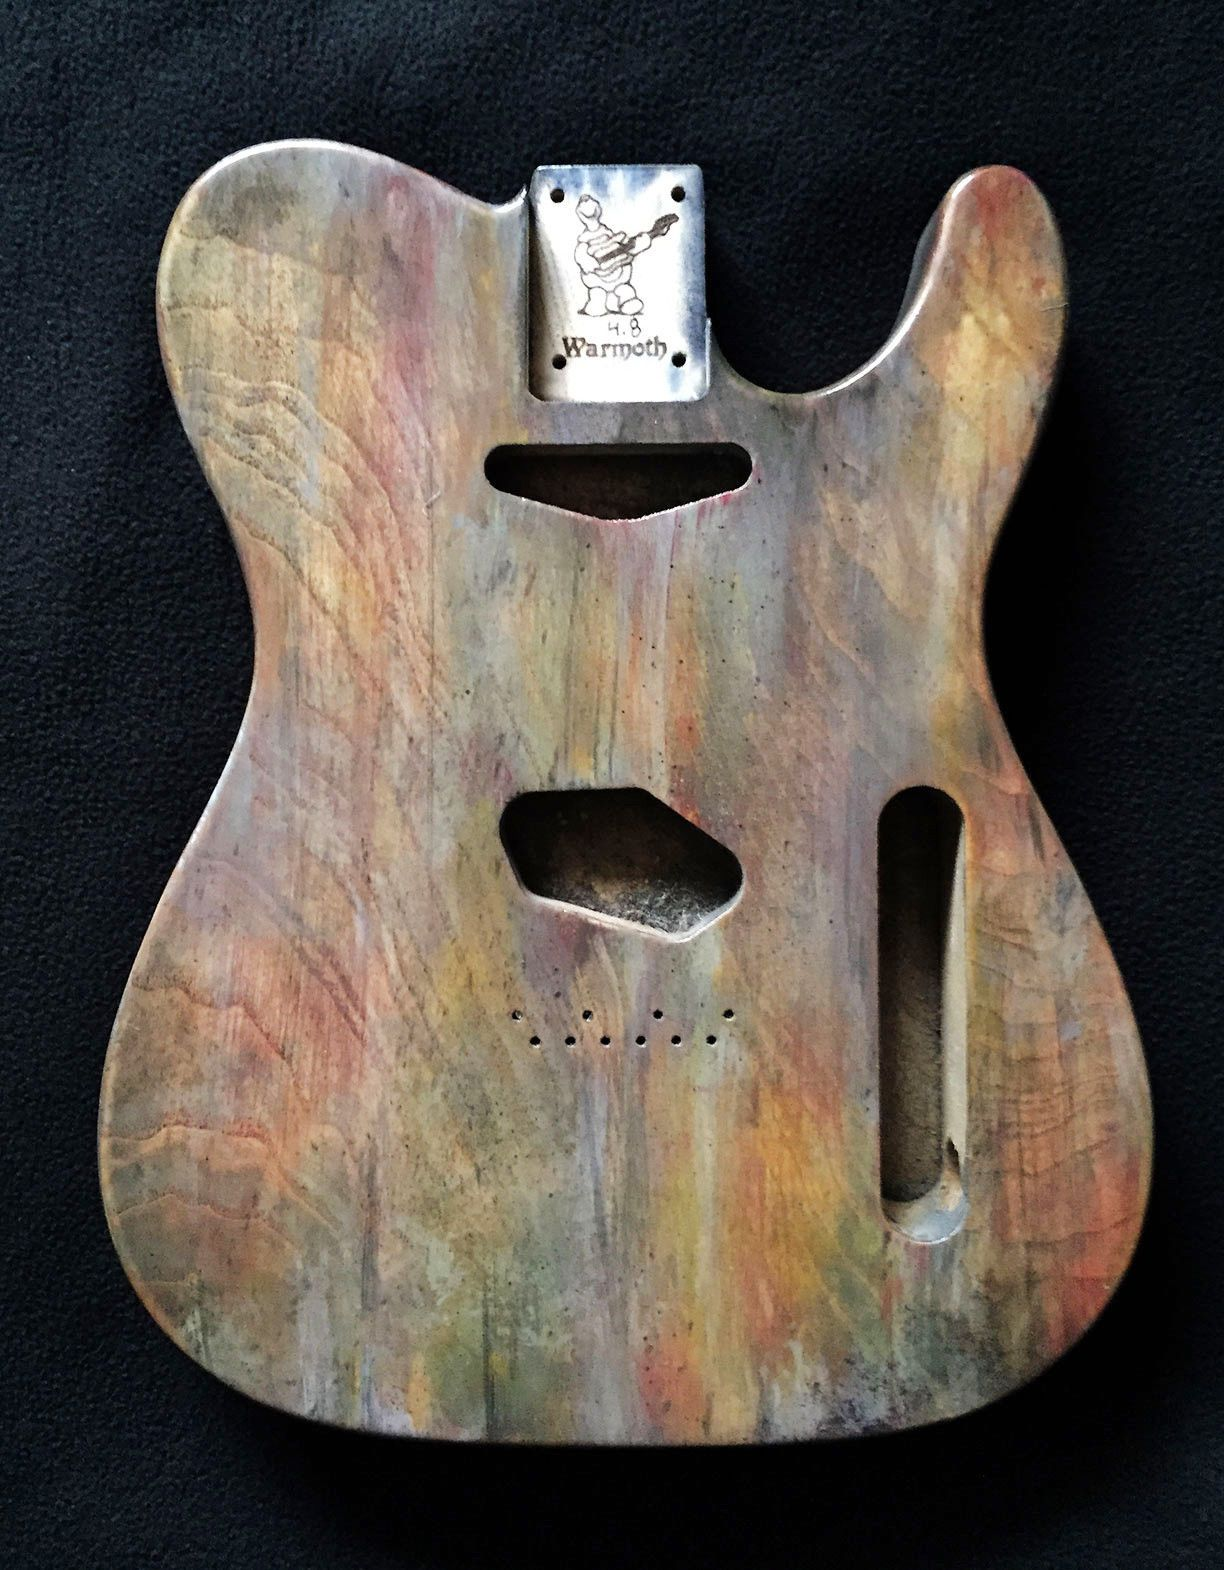 Custom Hand-Painted Warmoth Tele Body (Swamp Ash